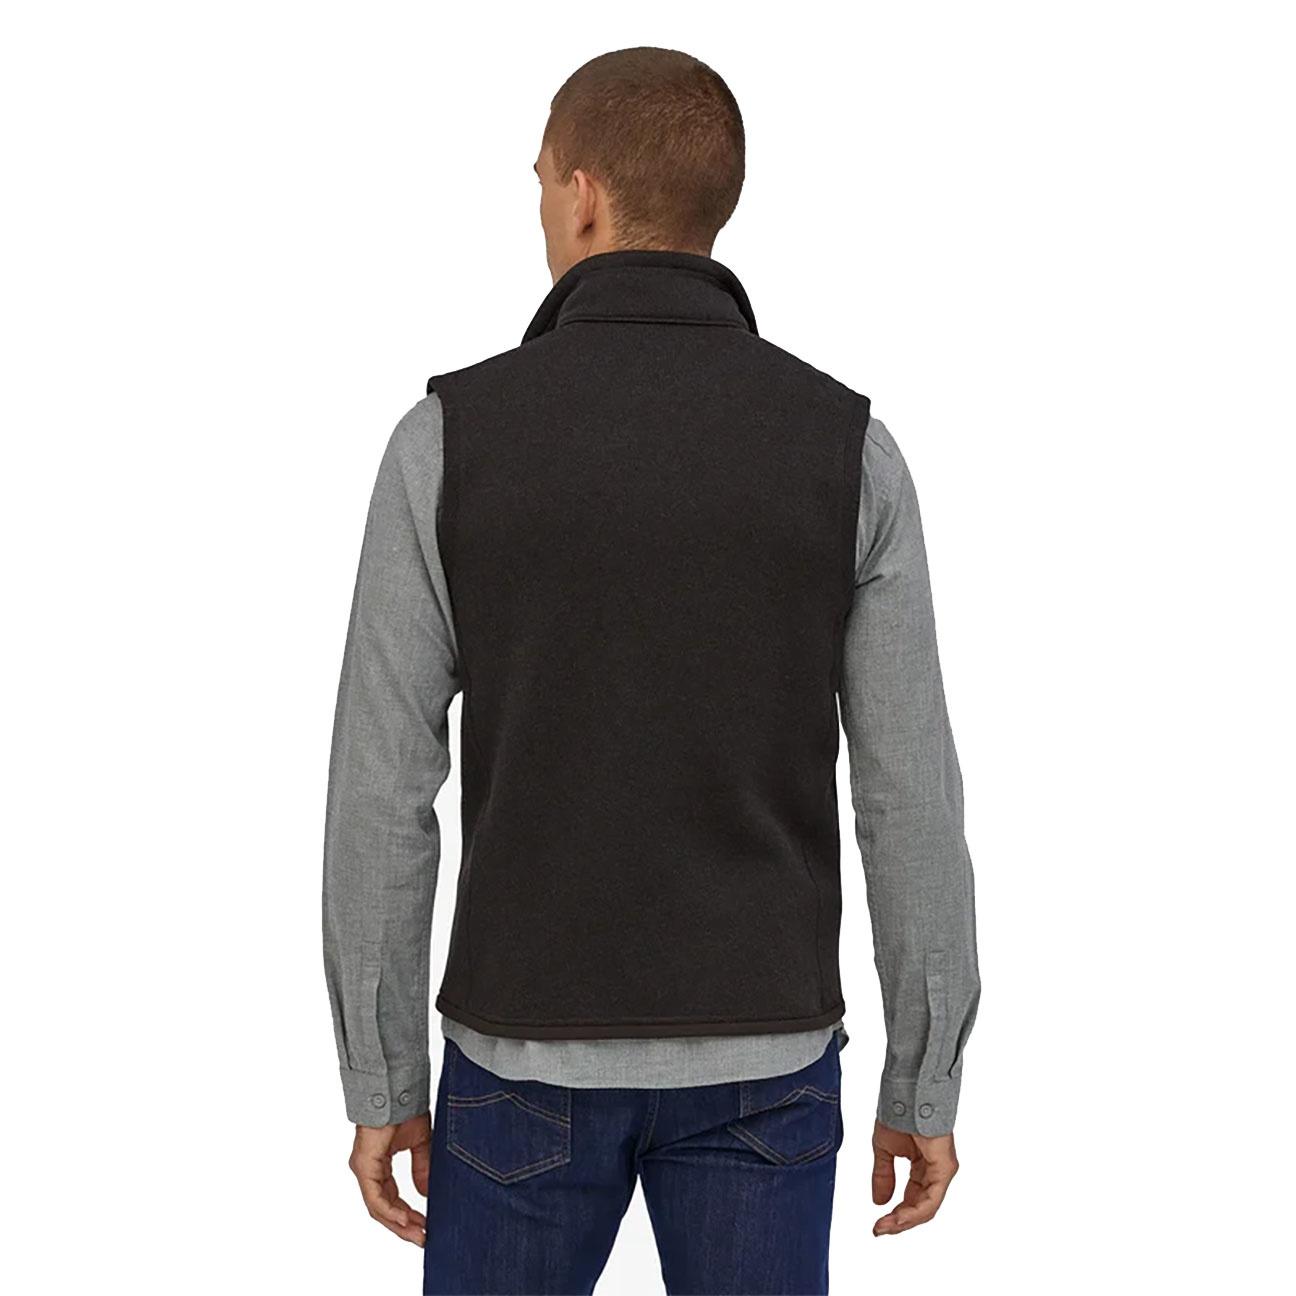 Men's Better Sweater Fleece Vest, Black-3